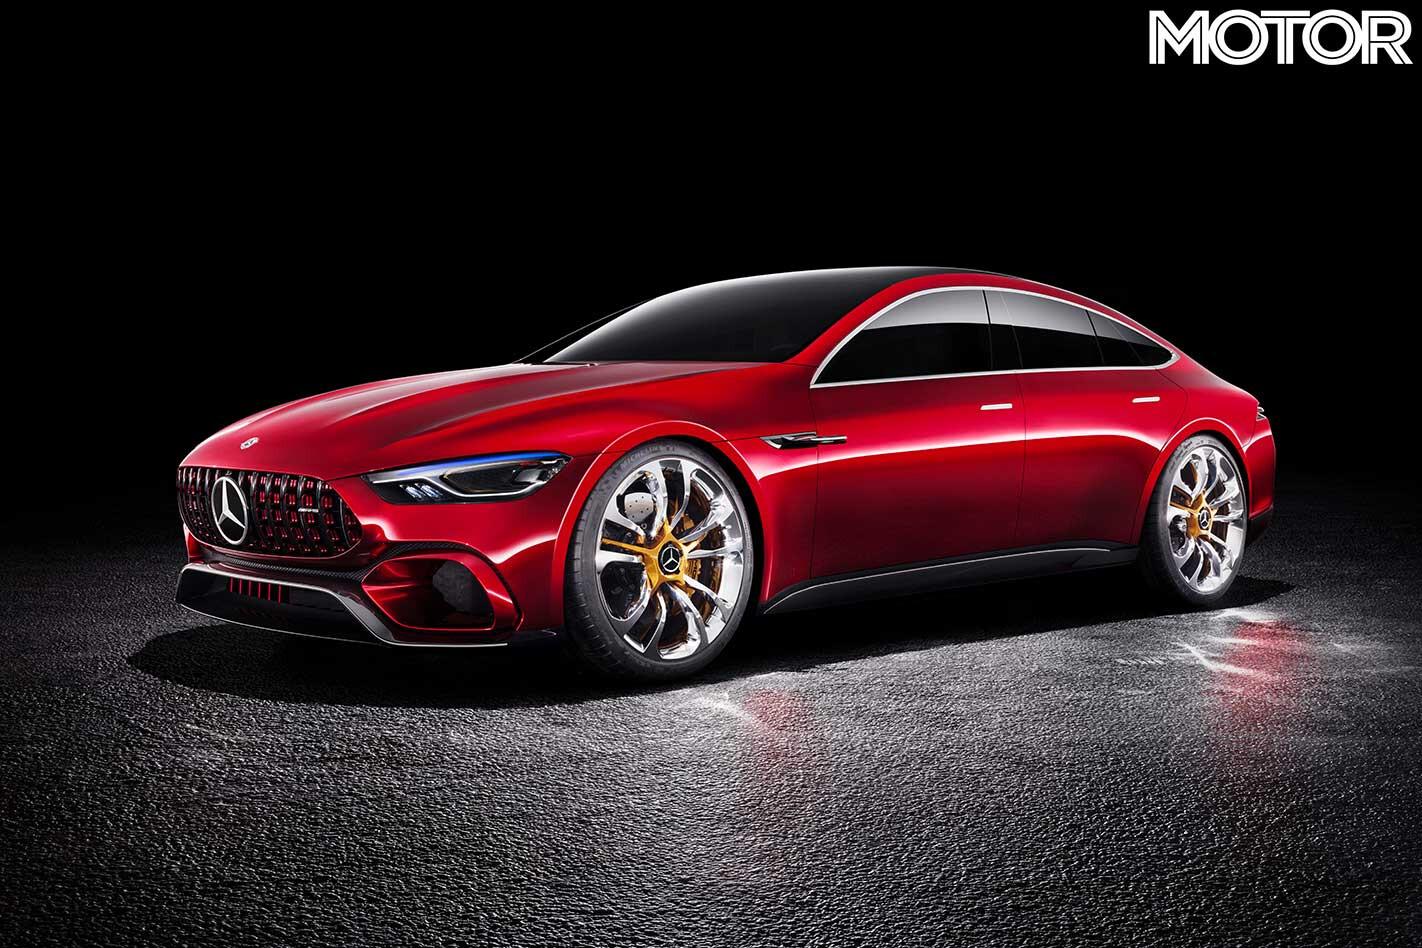 2012017 AMG GT Concept Jpg